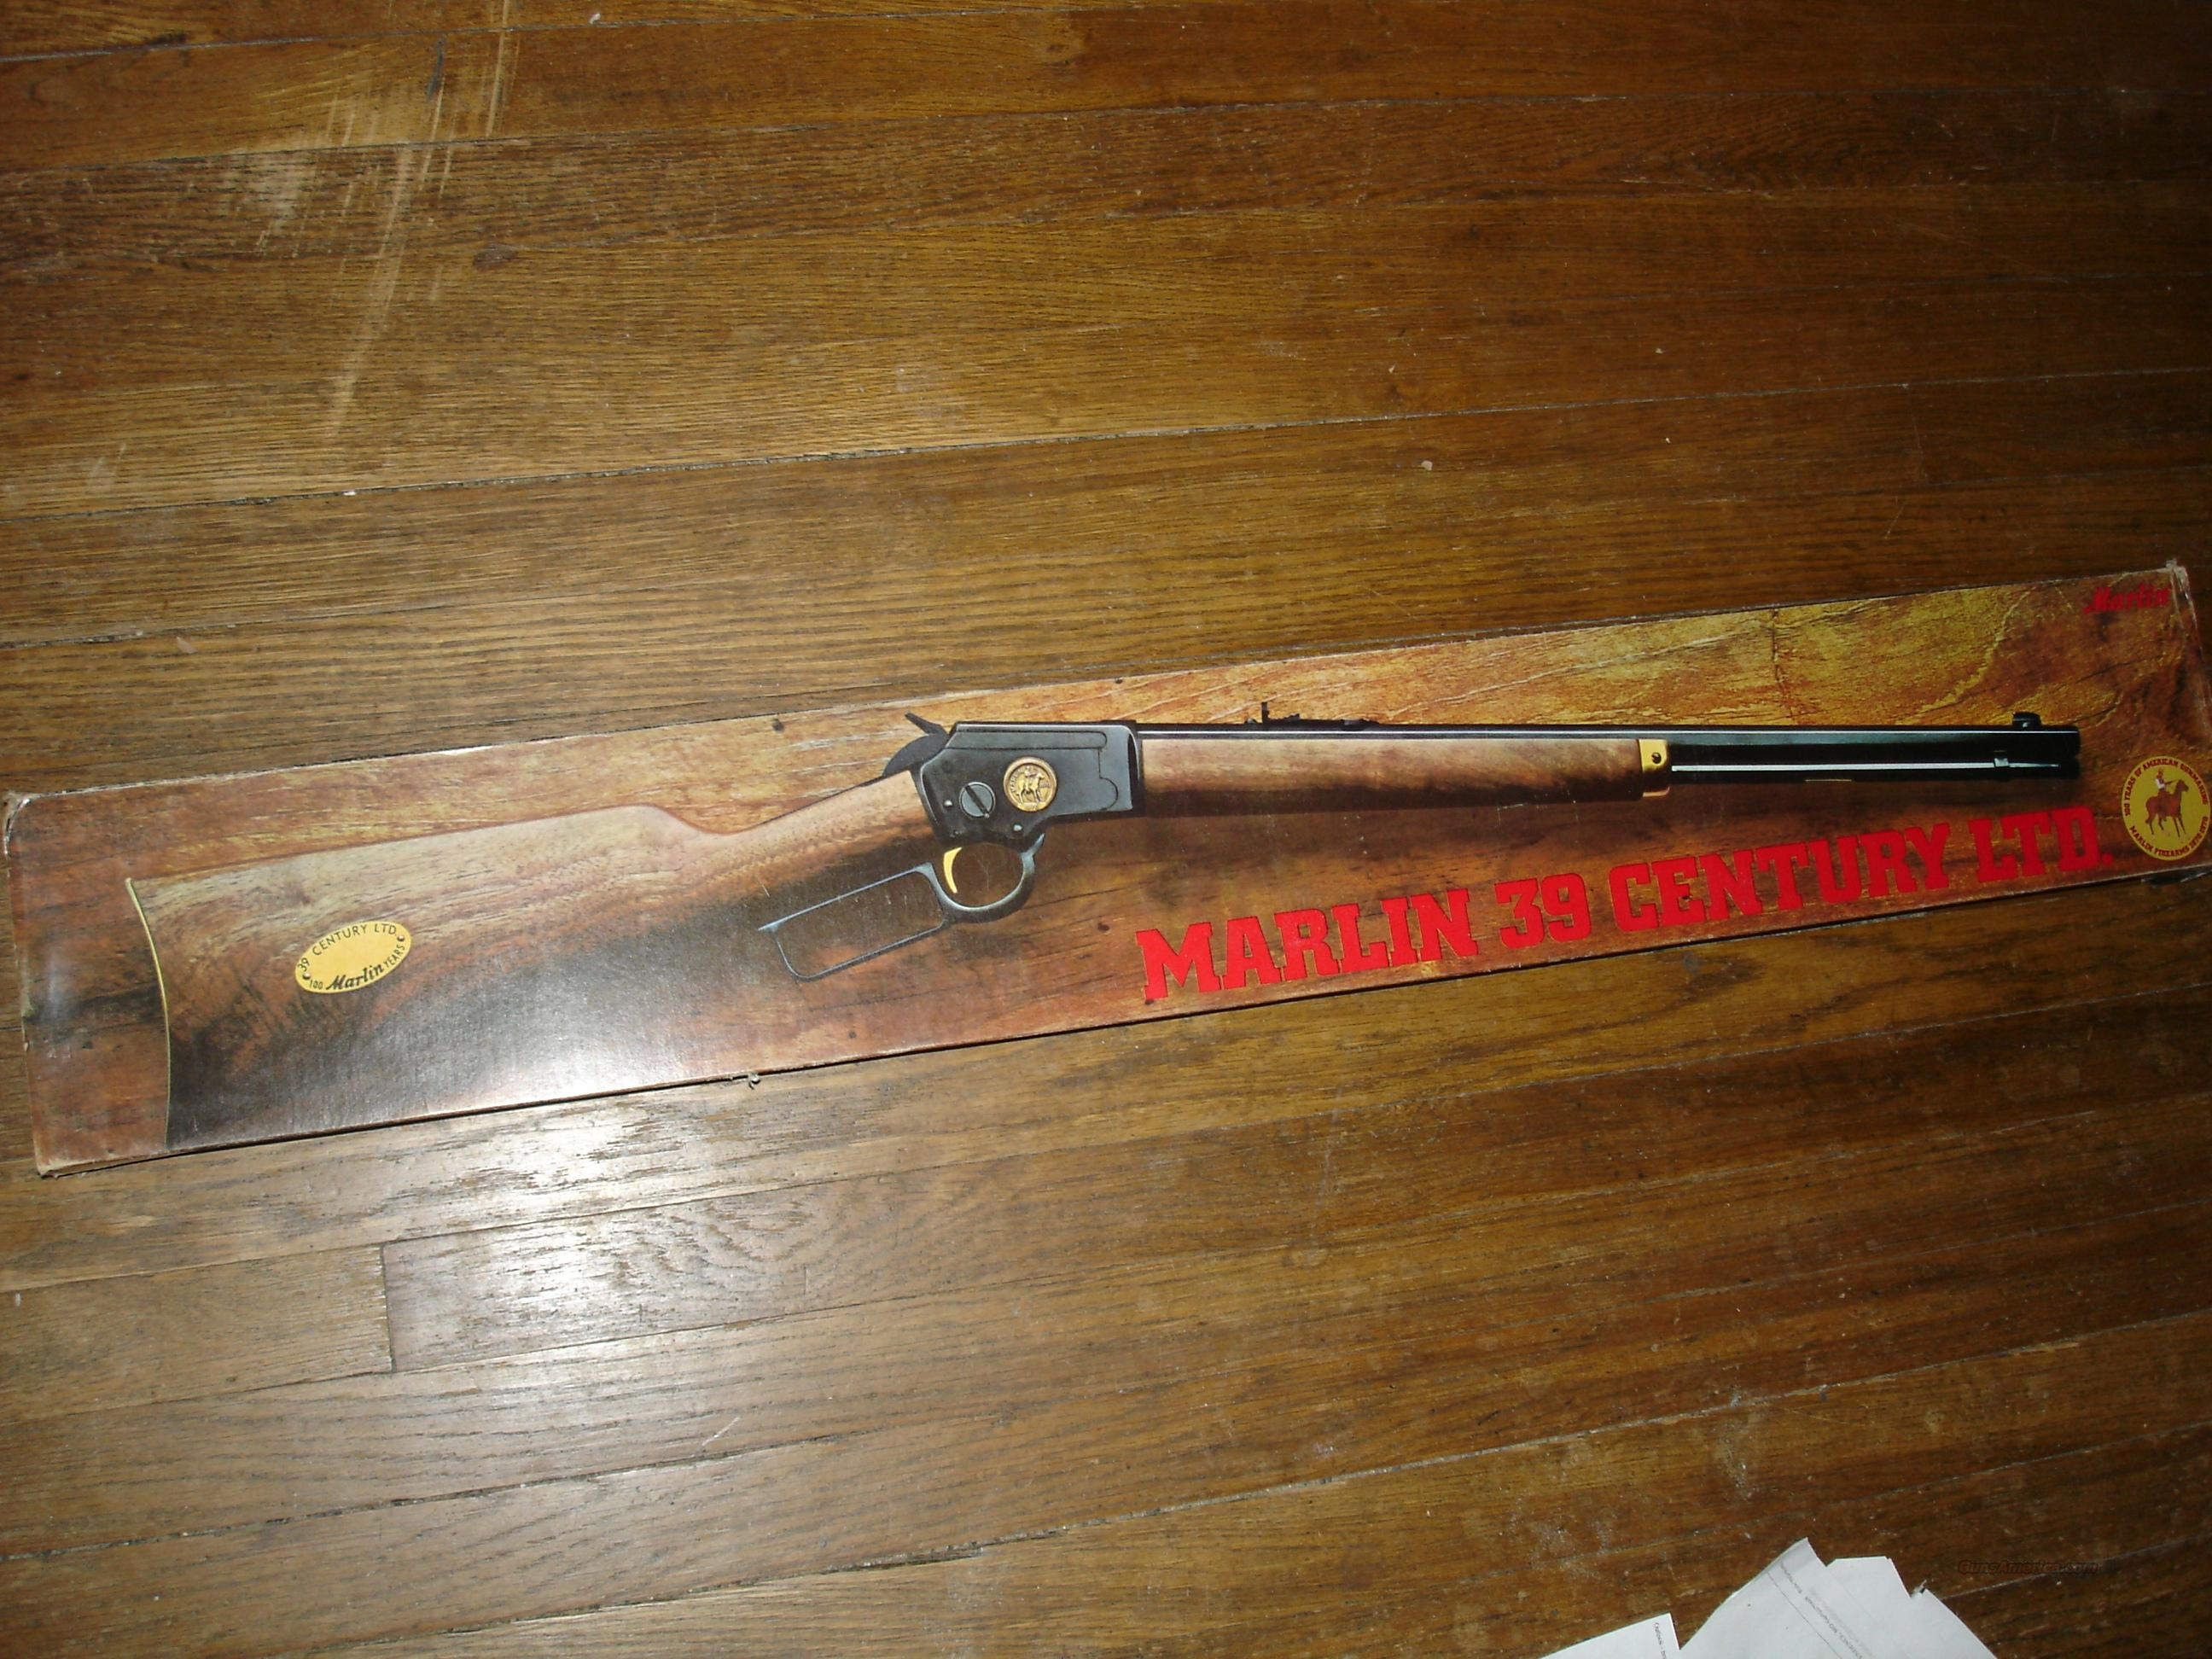 Dating marlin 39a rifles